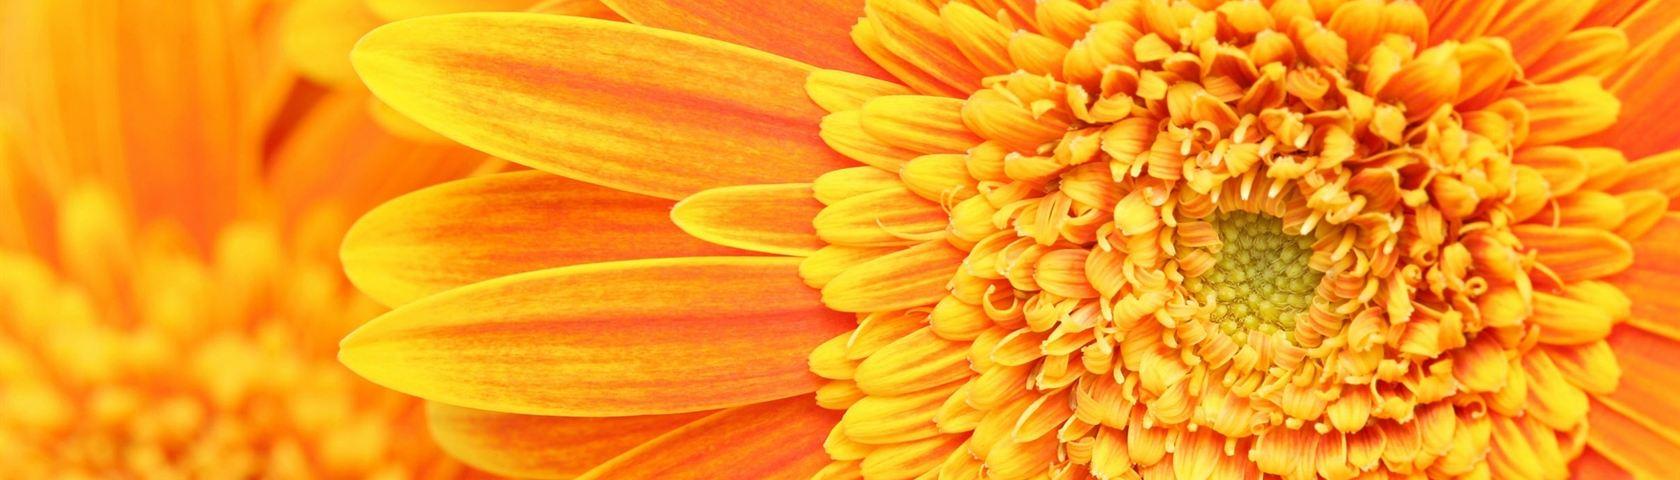 Orange-Yellow Gerbera Daisy